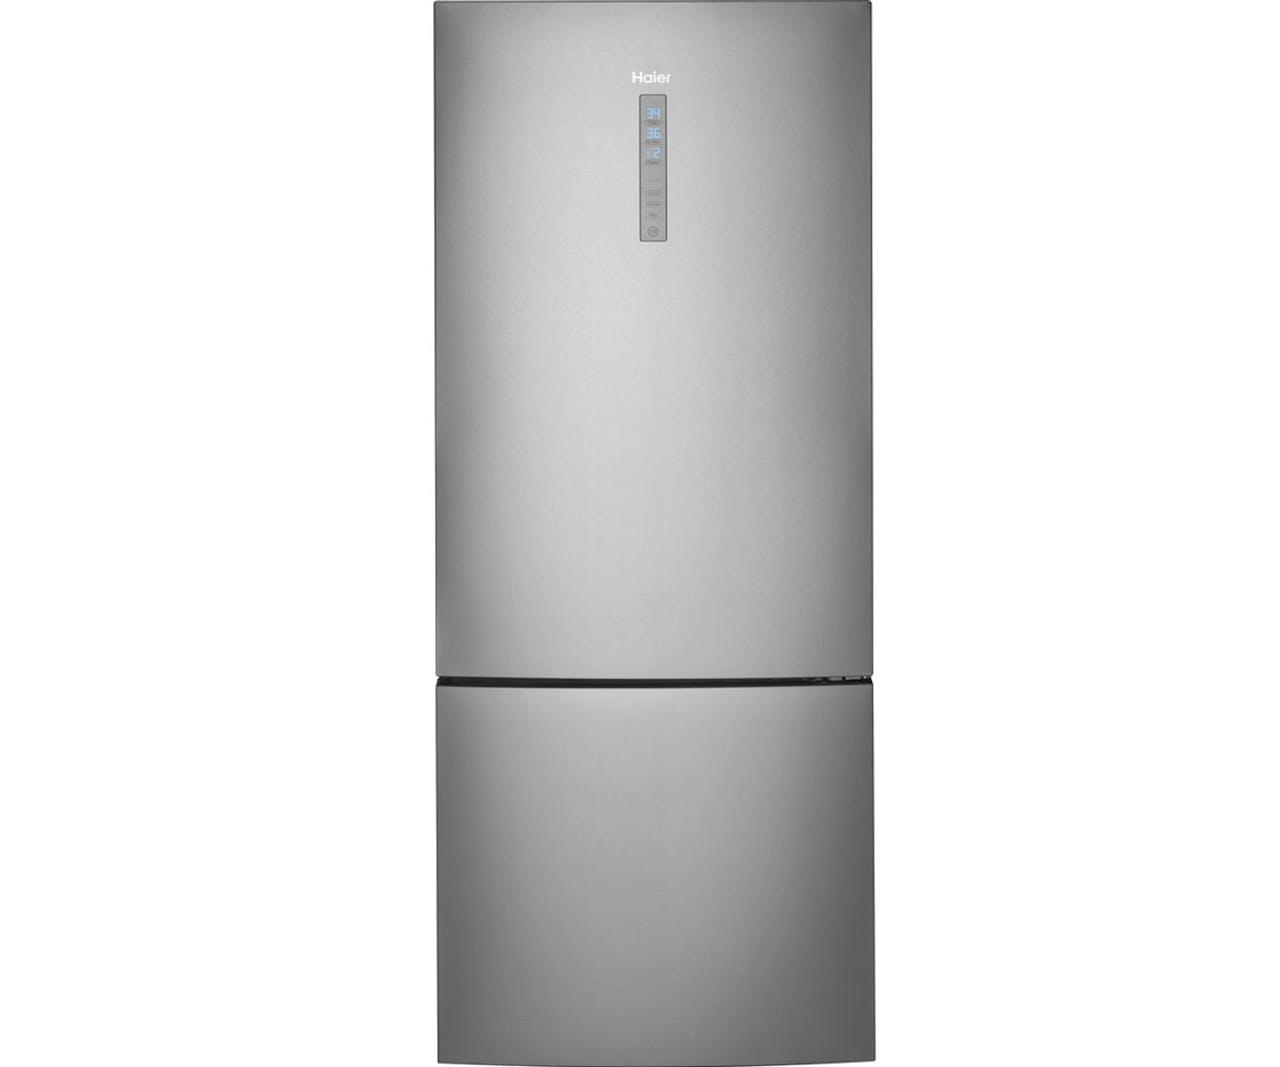 Haier Bottom Freezer Refrigerators